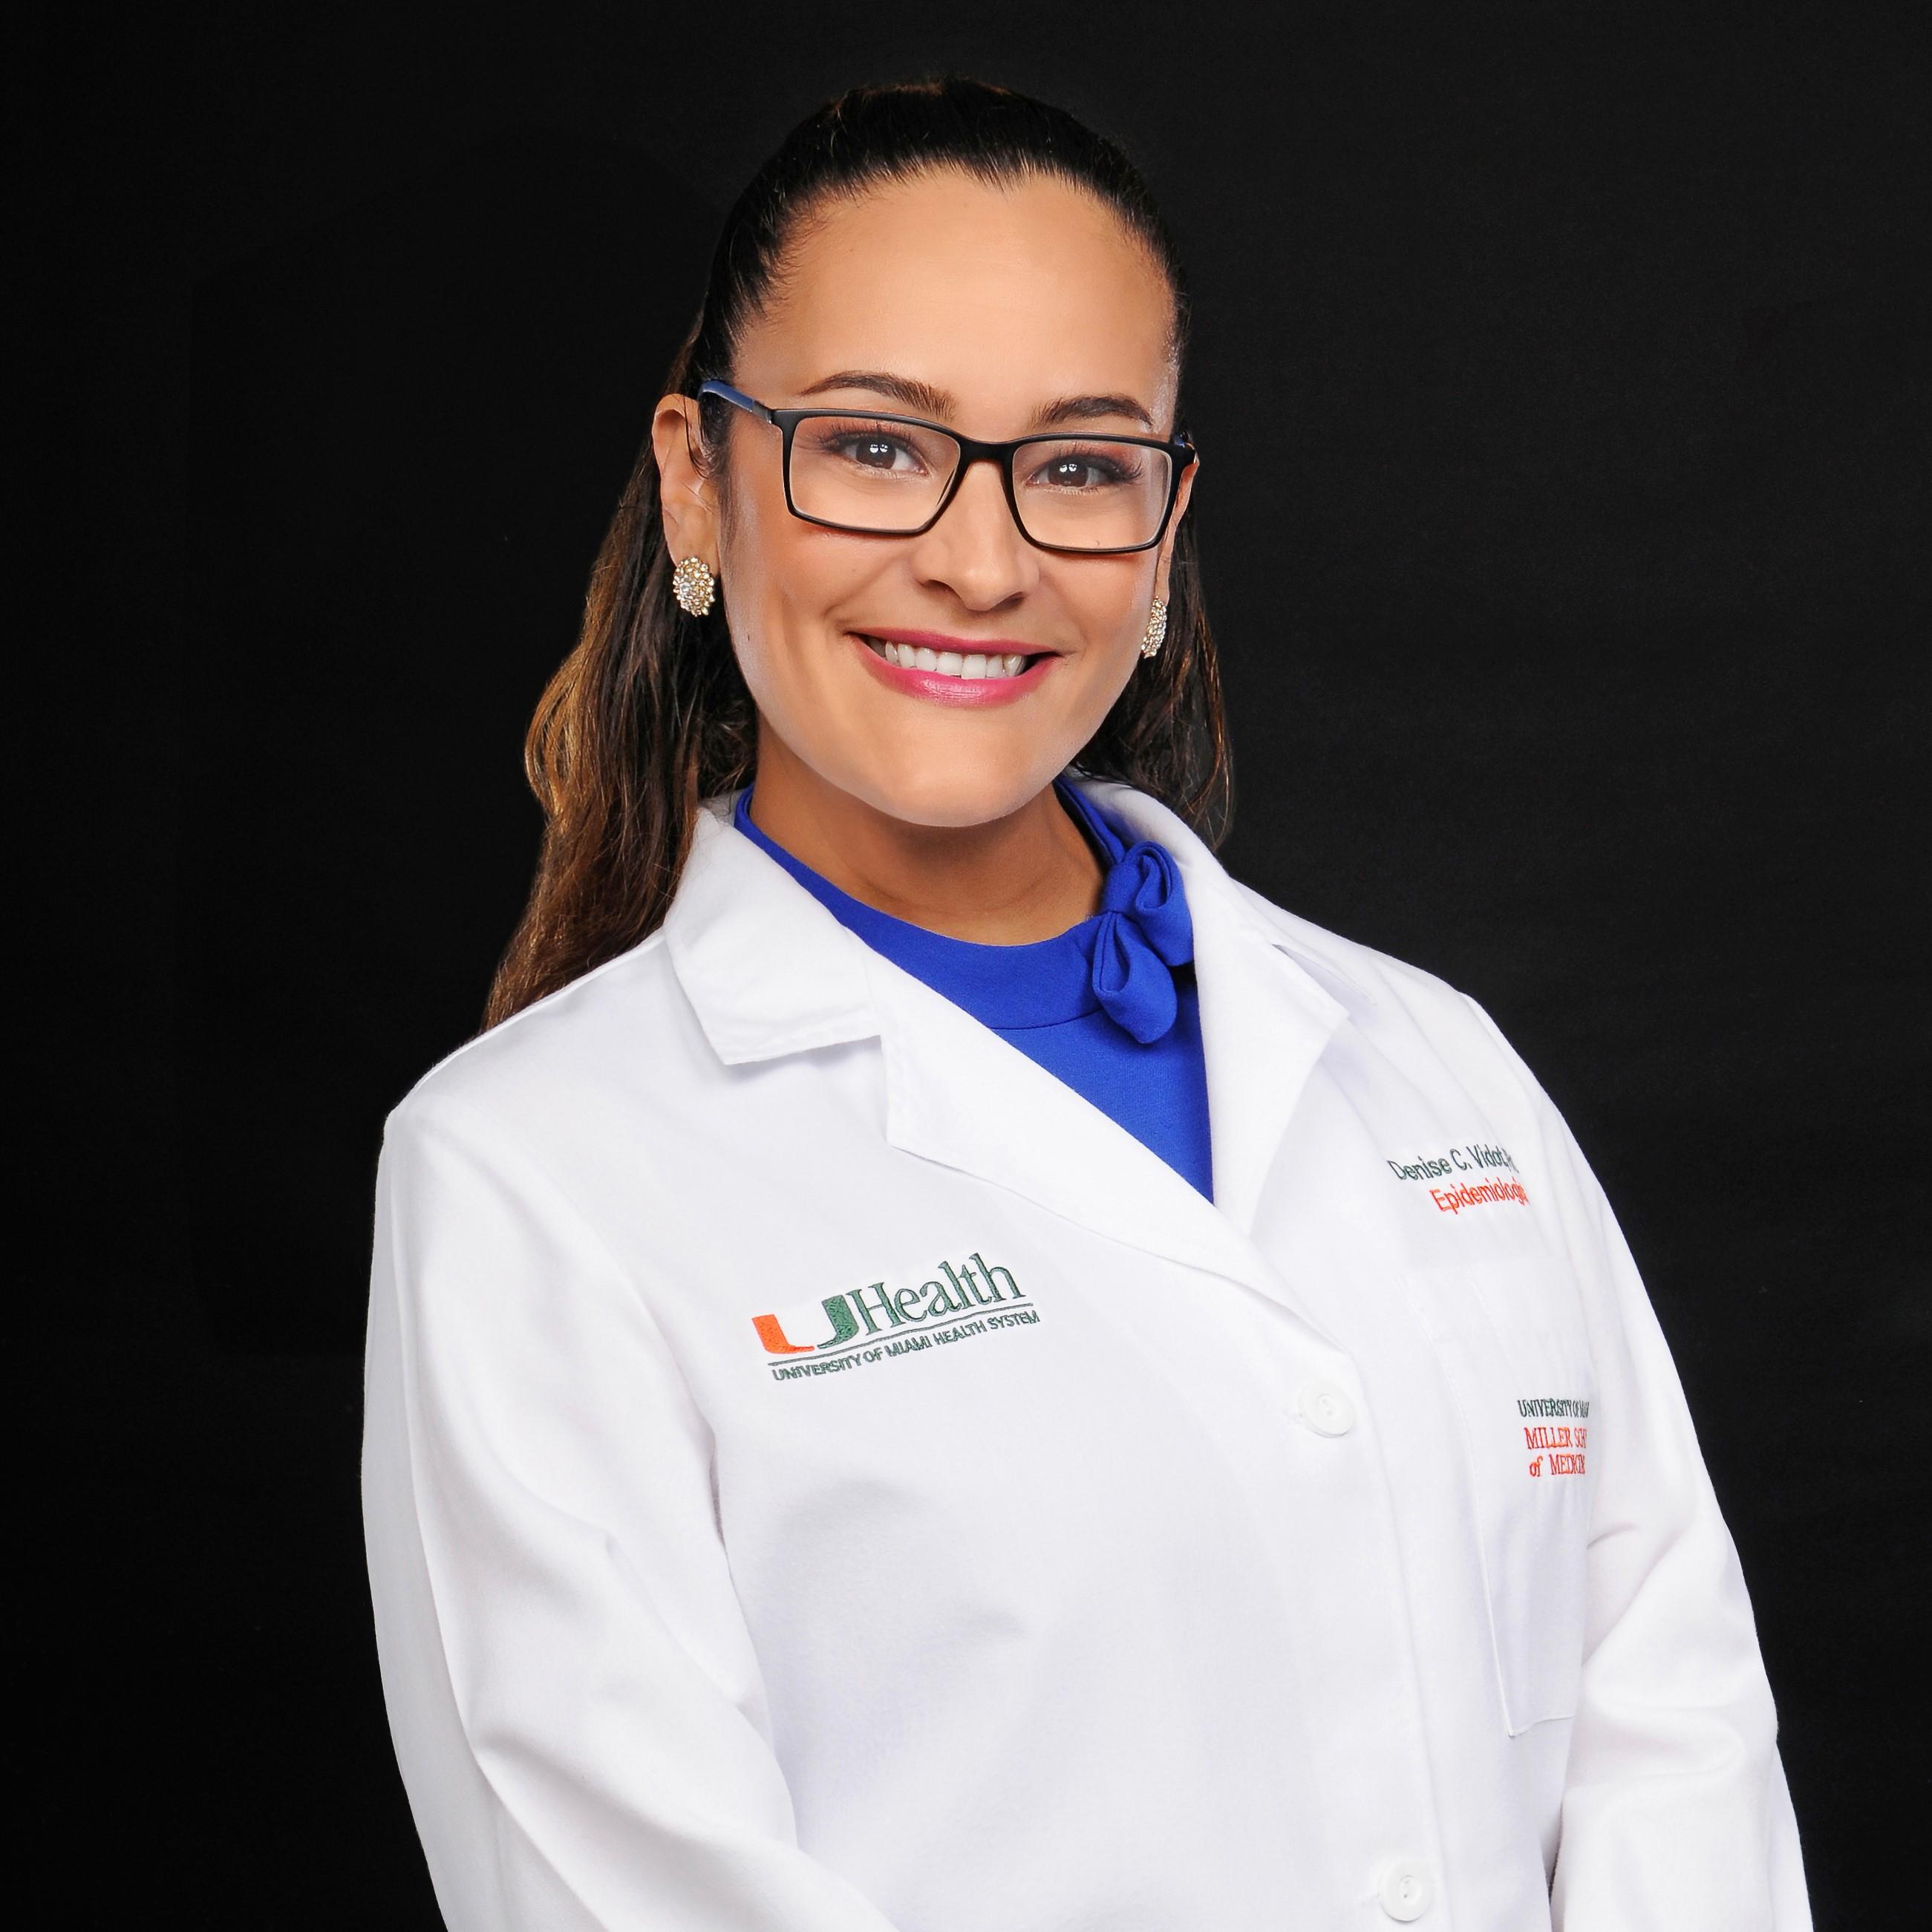 Dr. Denise Vidot, Ph.D. '15, A.B. '08,